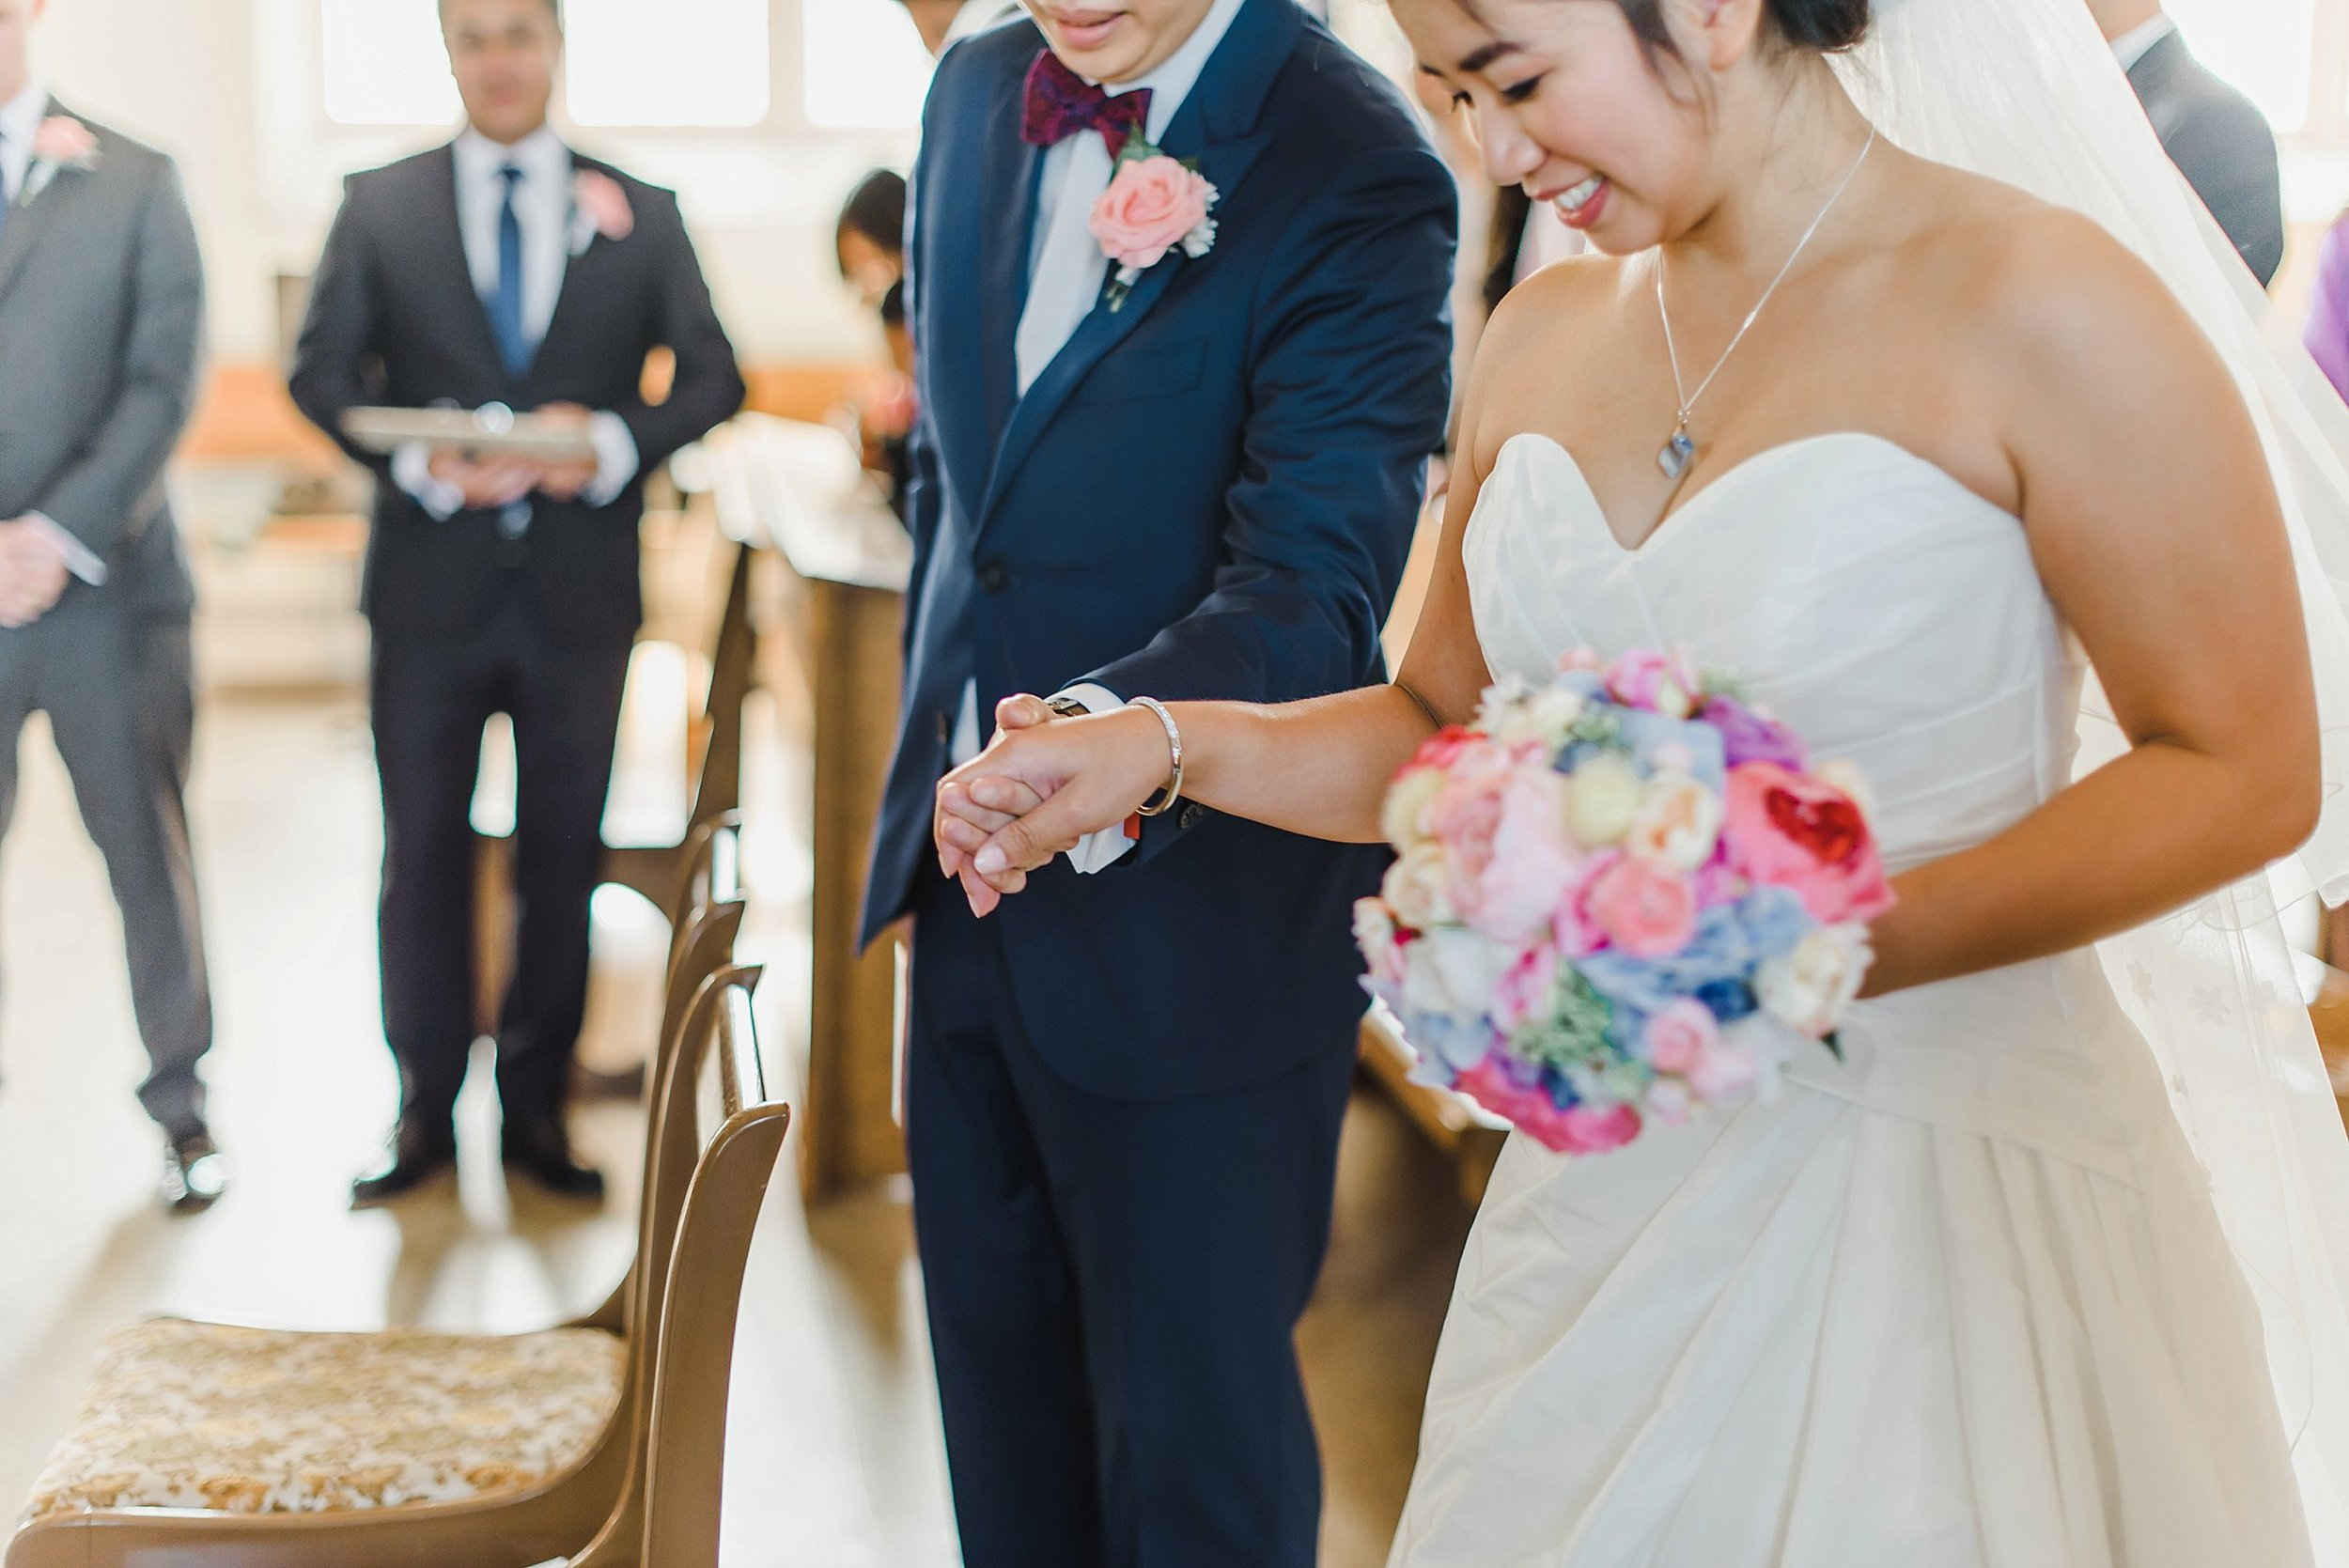 light airy indie fine art ottawa wedding photographer | Ali and Batoul Photography_1488.jpg